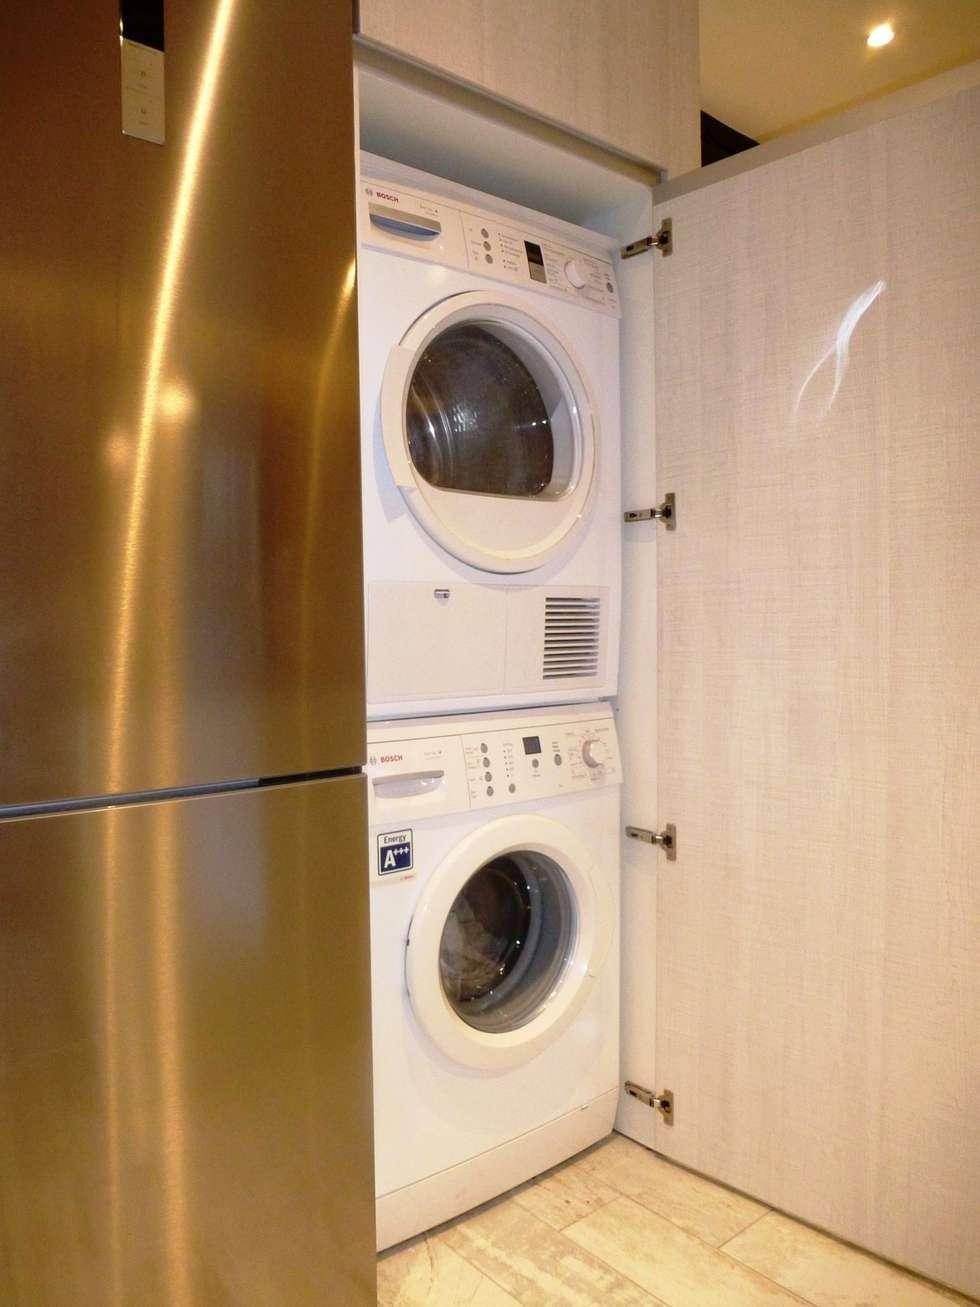 Mueble lavadora secadora tags mas de ideas increa bles for Mueble columna lavadora secadora